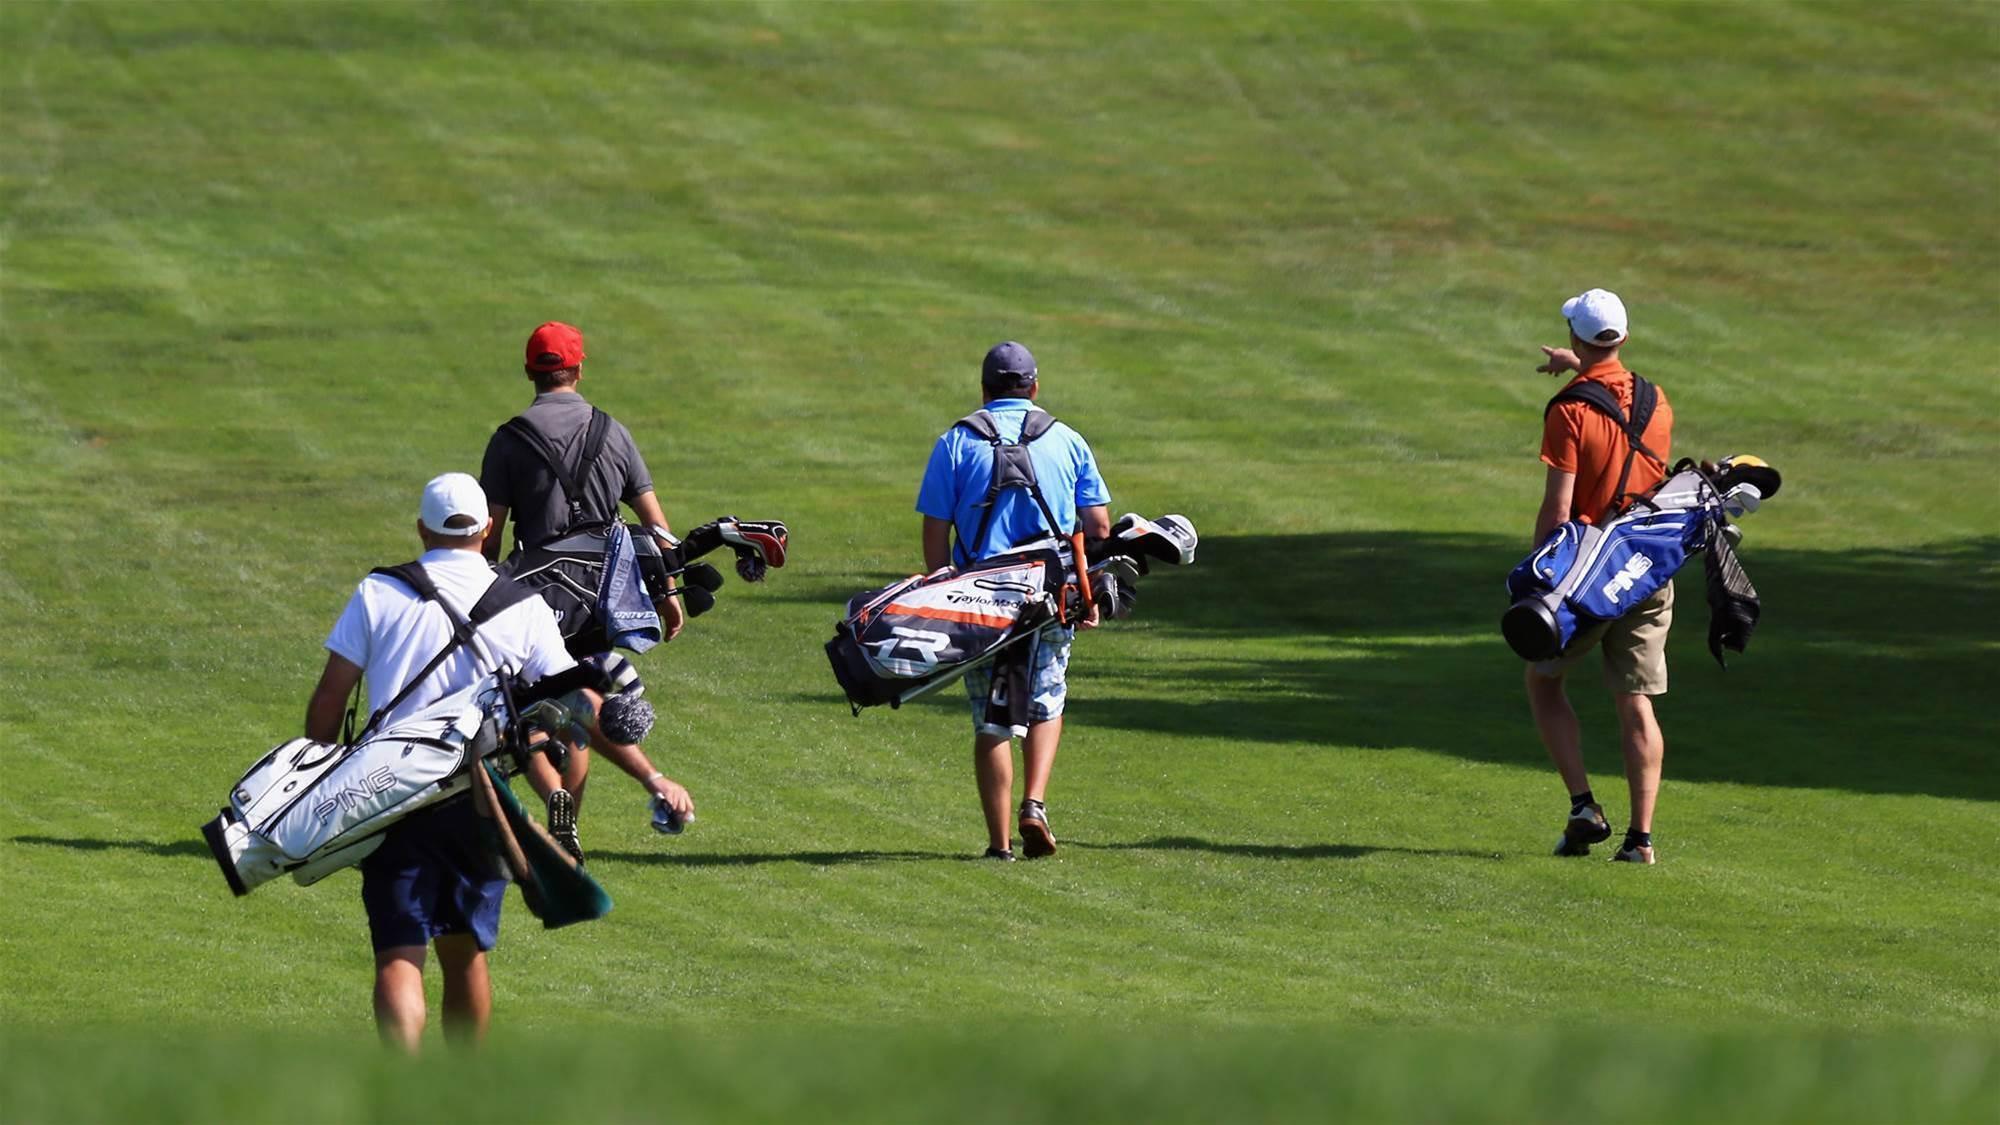 Golf Australia lauds Federal Budget